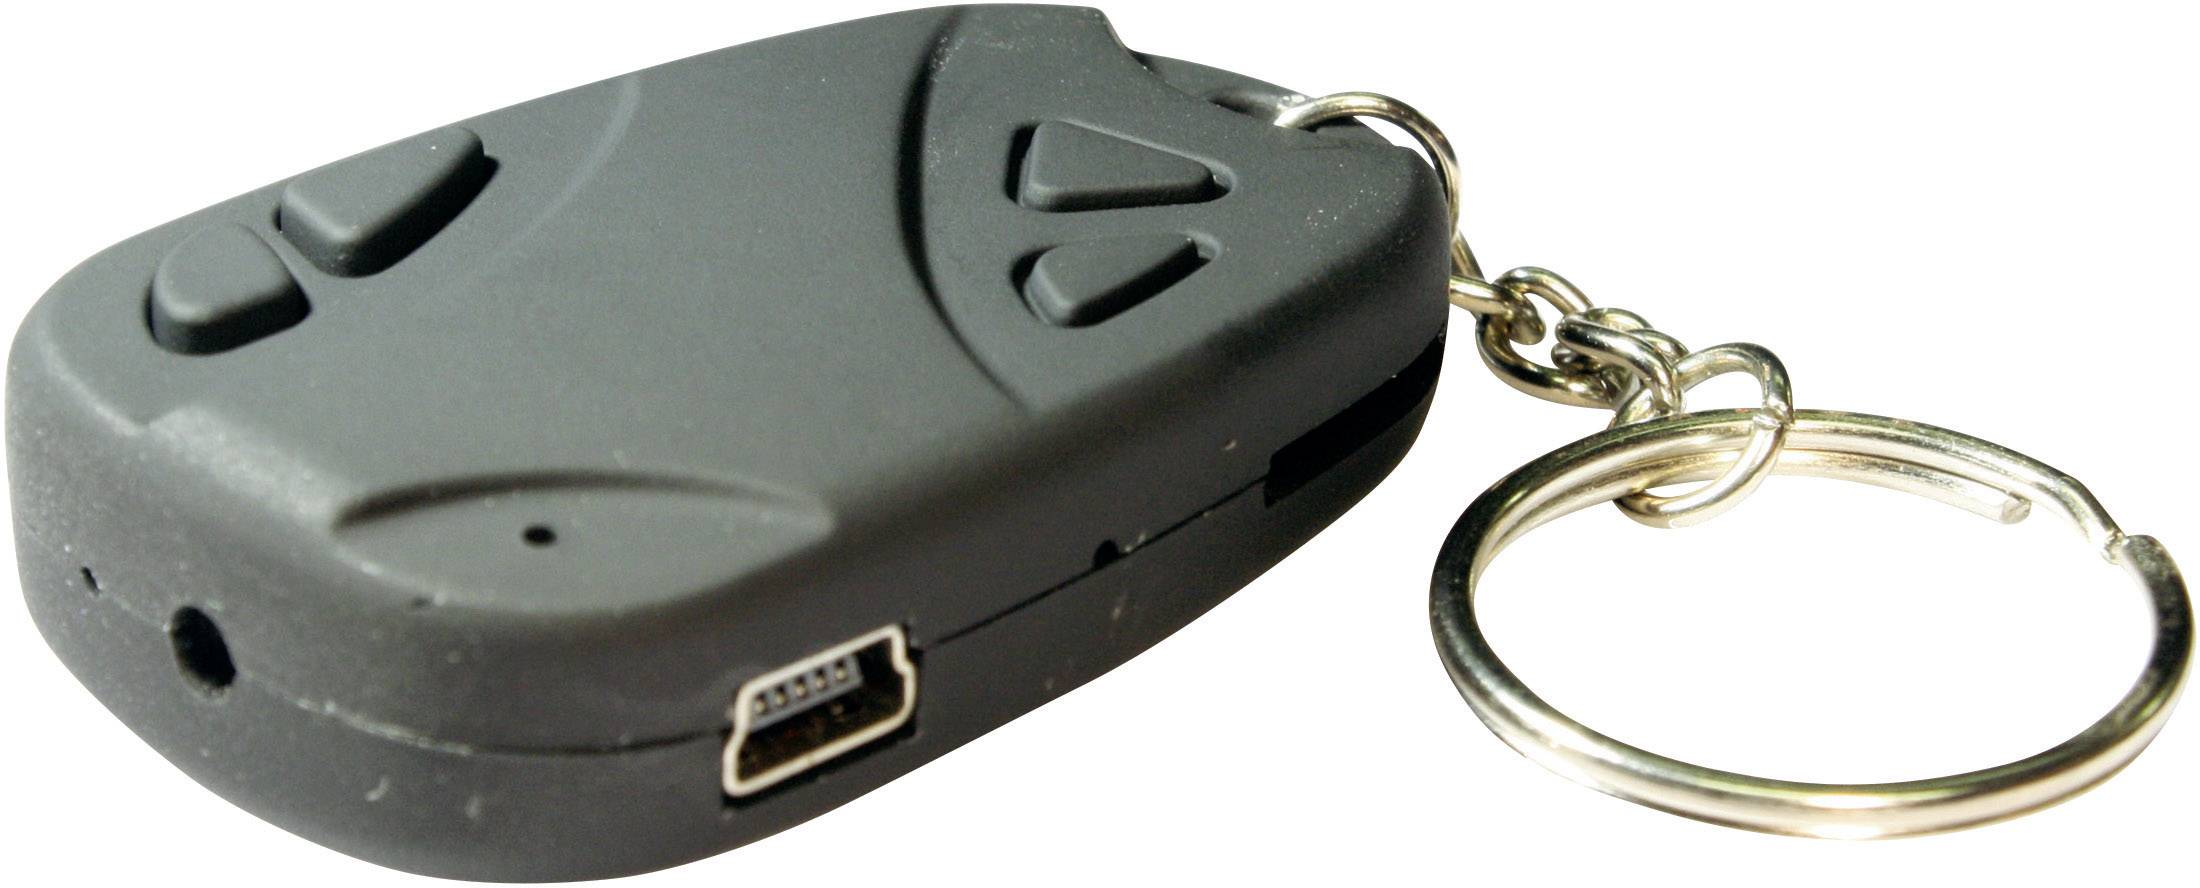 Mini kamera s DVR na přívesku, BS Key Chain, 720 x 480 px, microSD karta